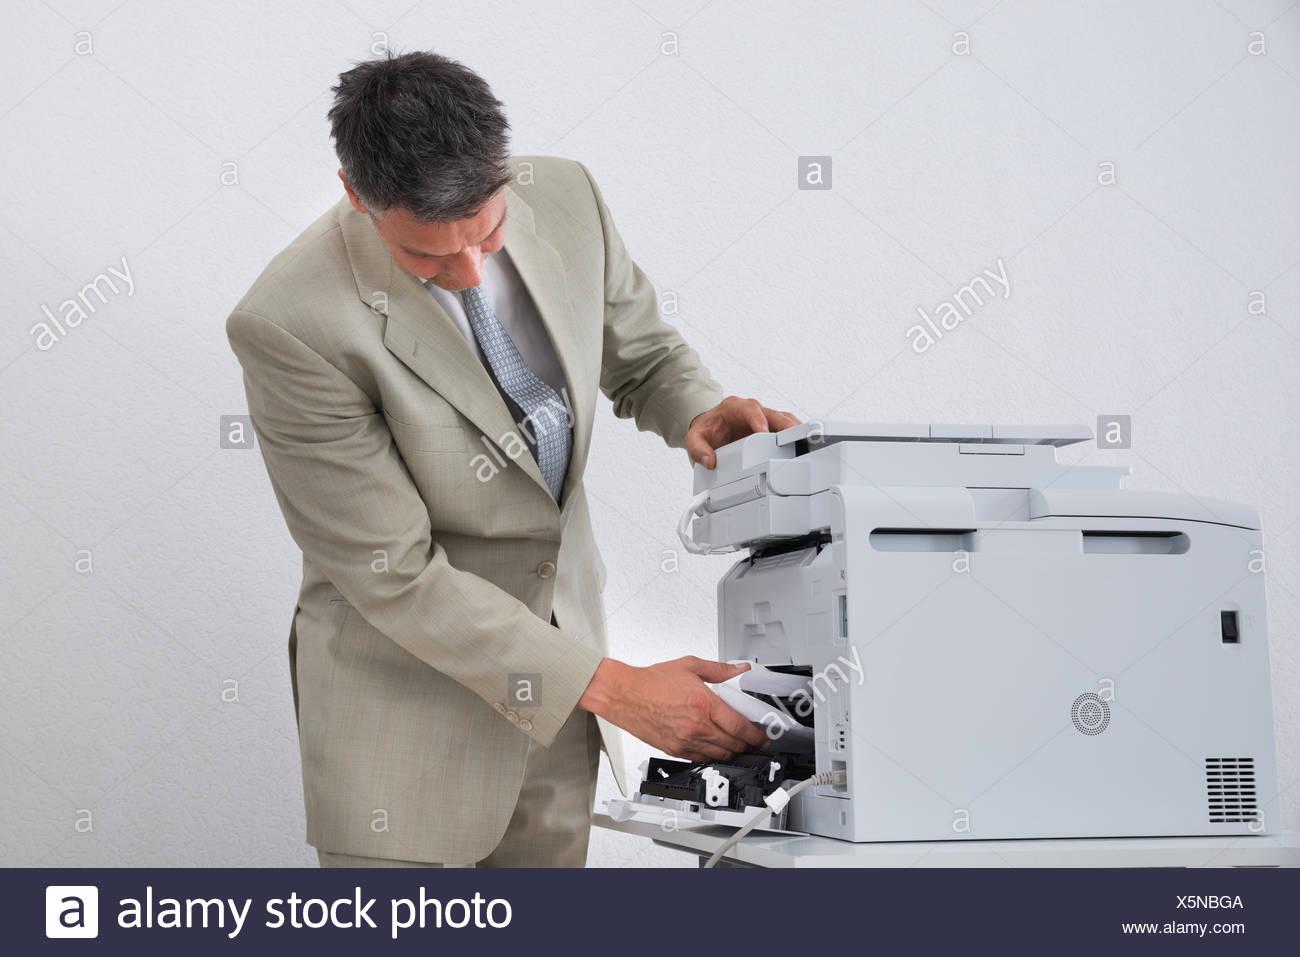 Businessman Removing Paper Stuck In Printer - Stock Image